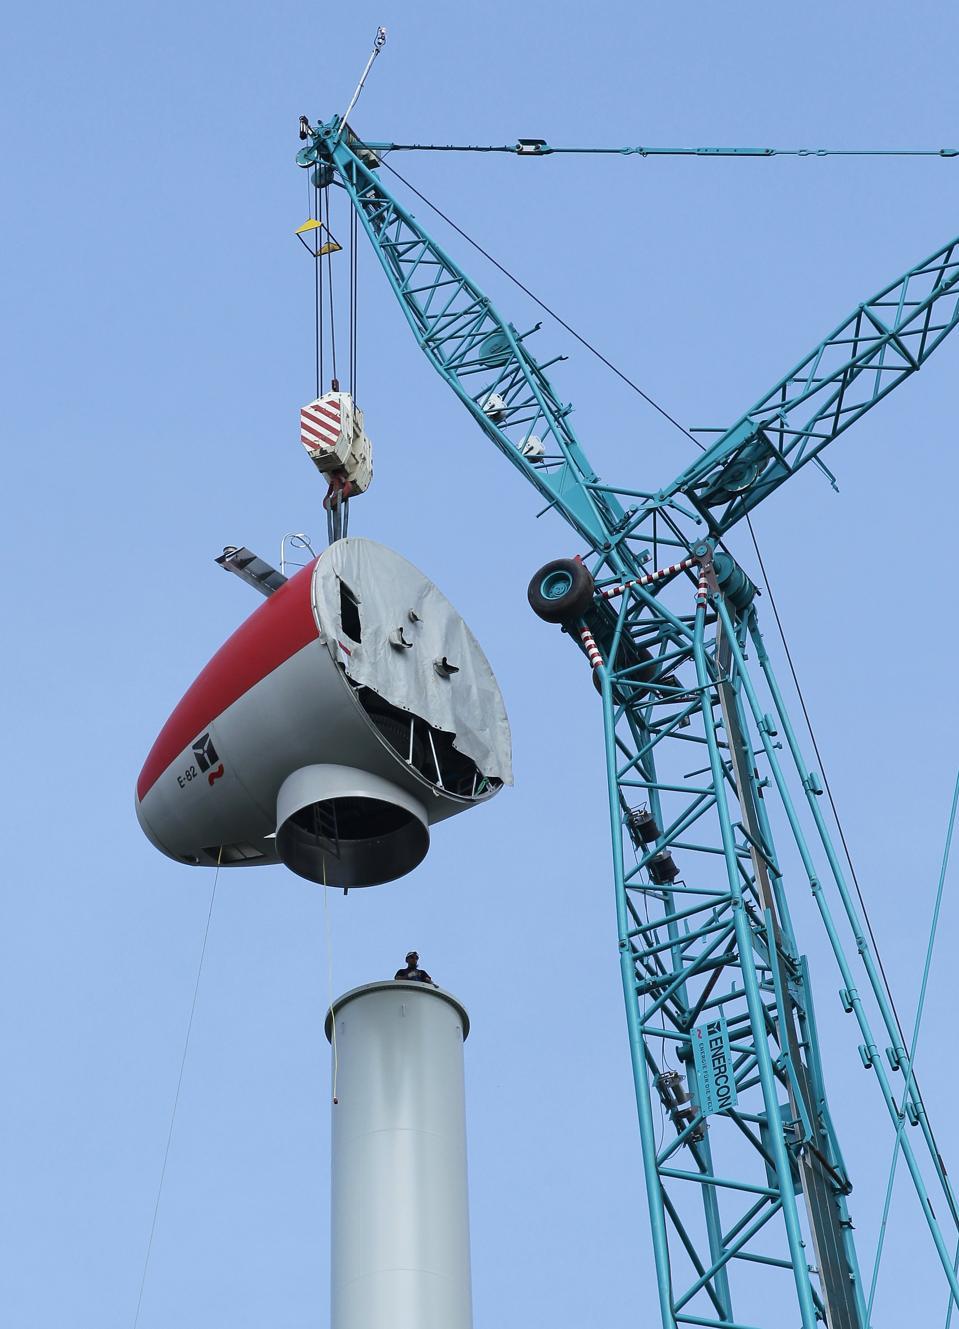 German wind turbine under construction.